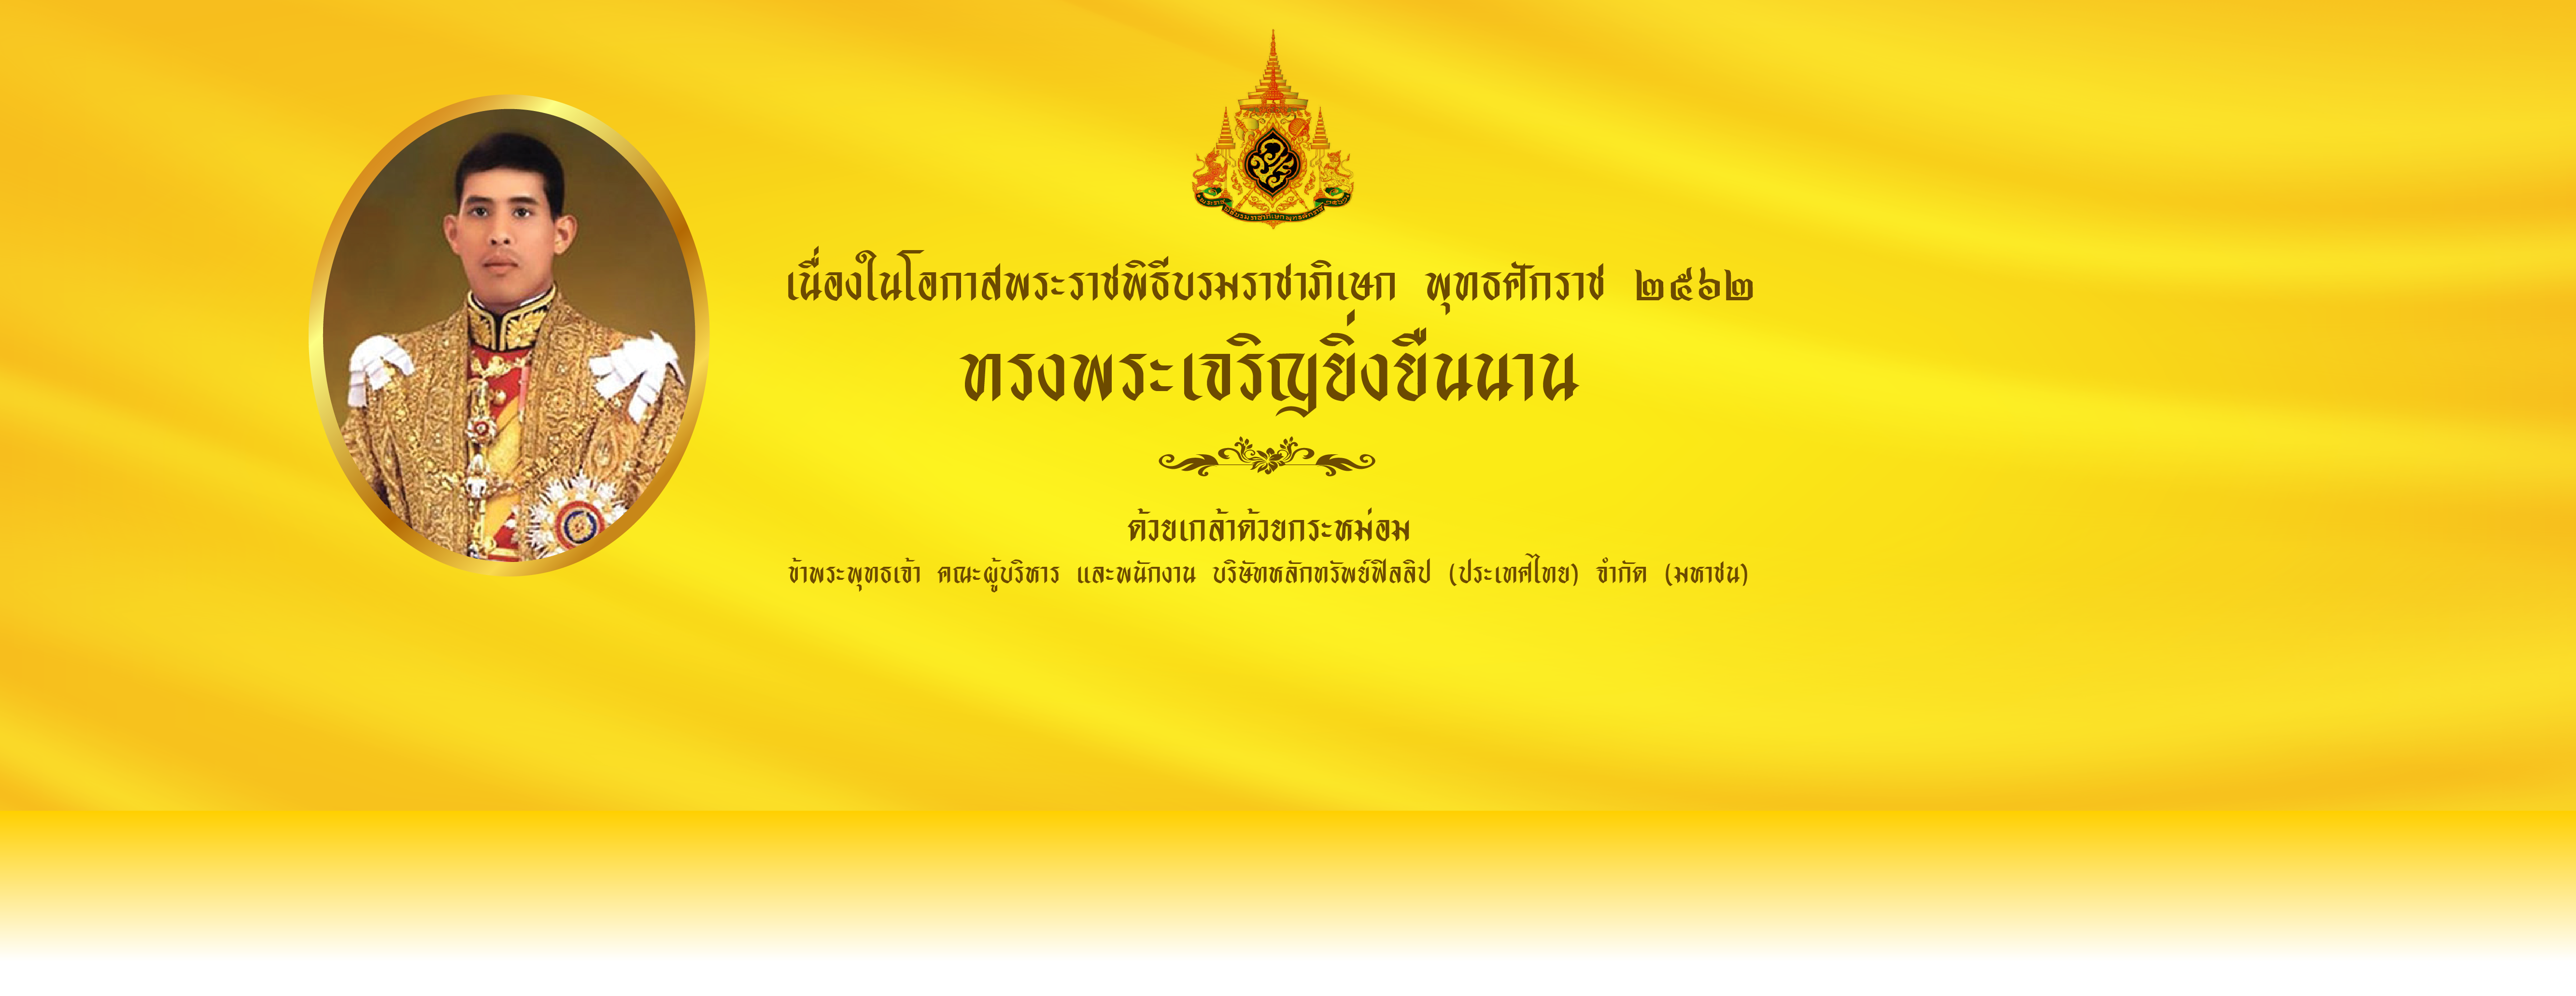 King Rama10 Coronation